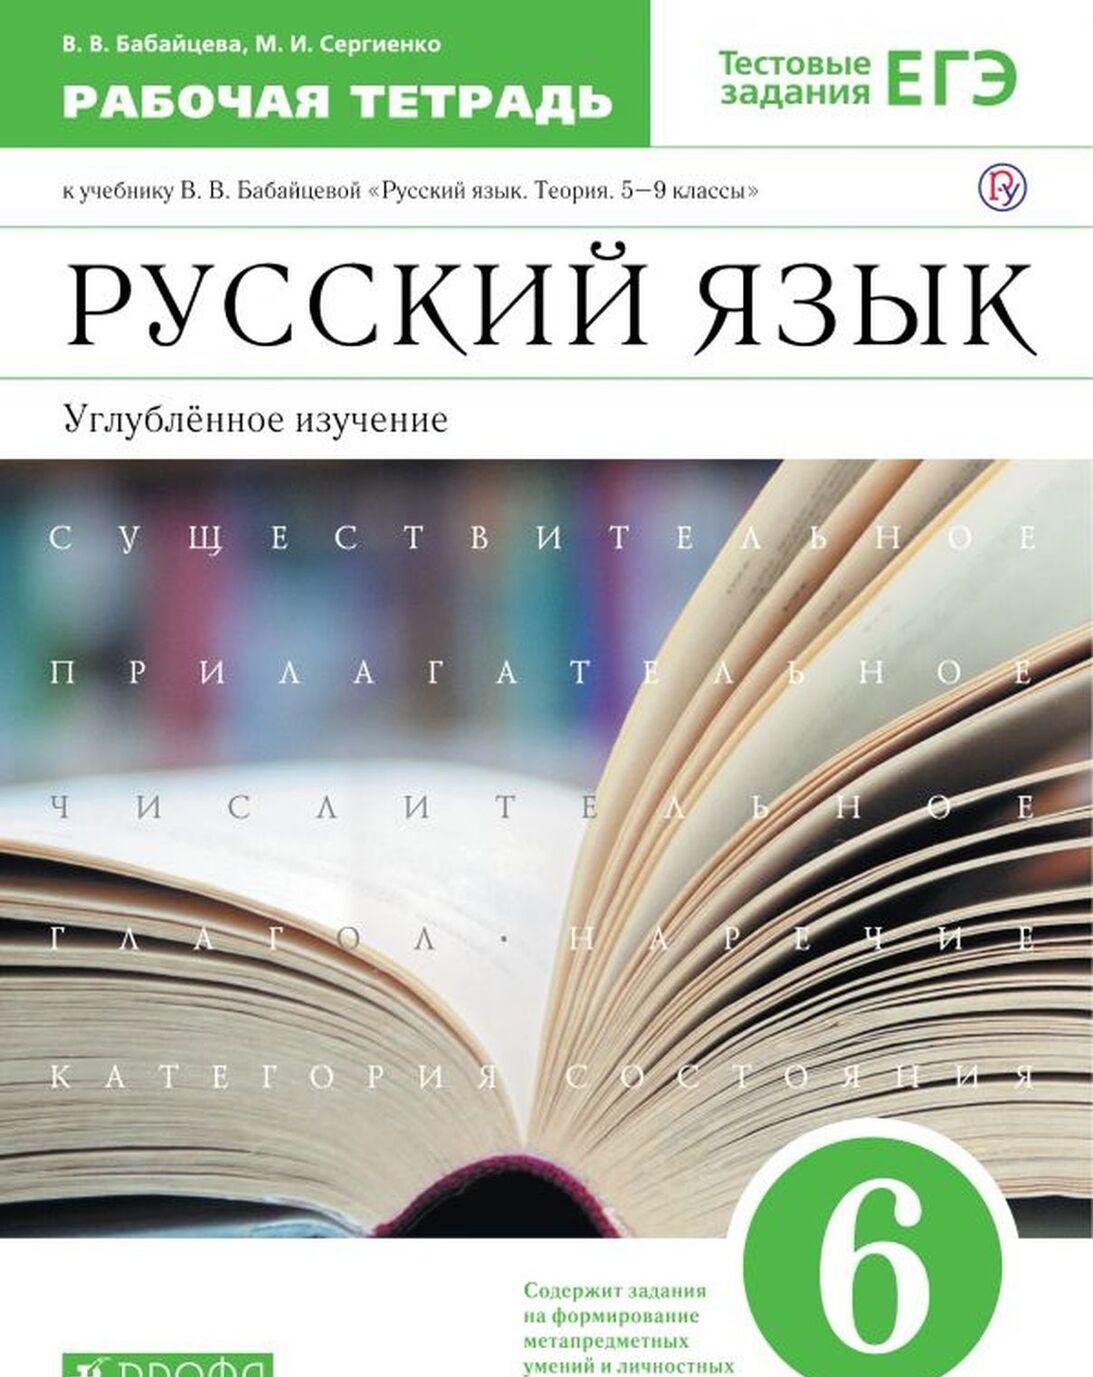 Russkij jazyk. 6 klass. Rabochaja tetrad. K uchebniku Babajtsevoj V. V. | Babajtseva Vera Vasilevna, Sergienko Marina Igorevna